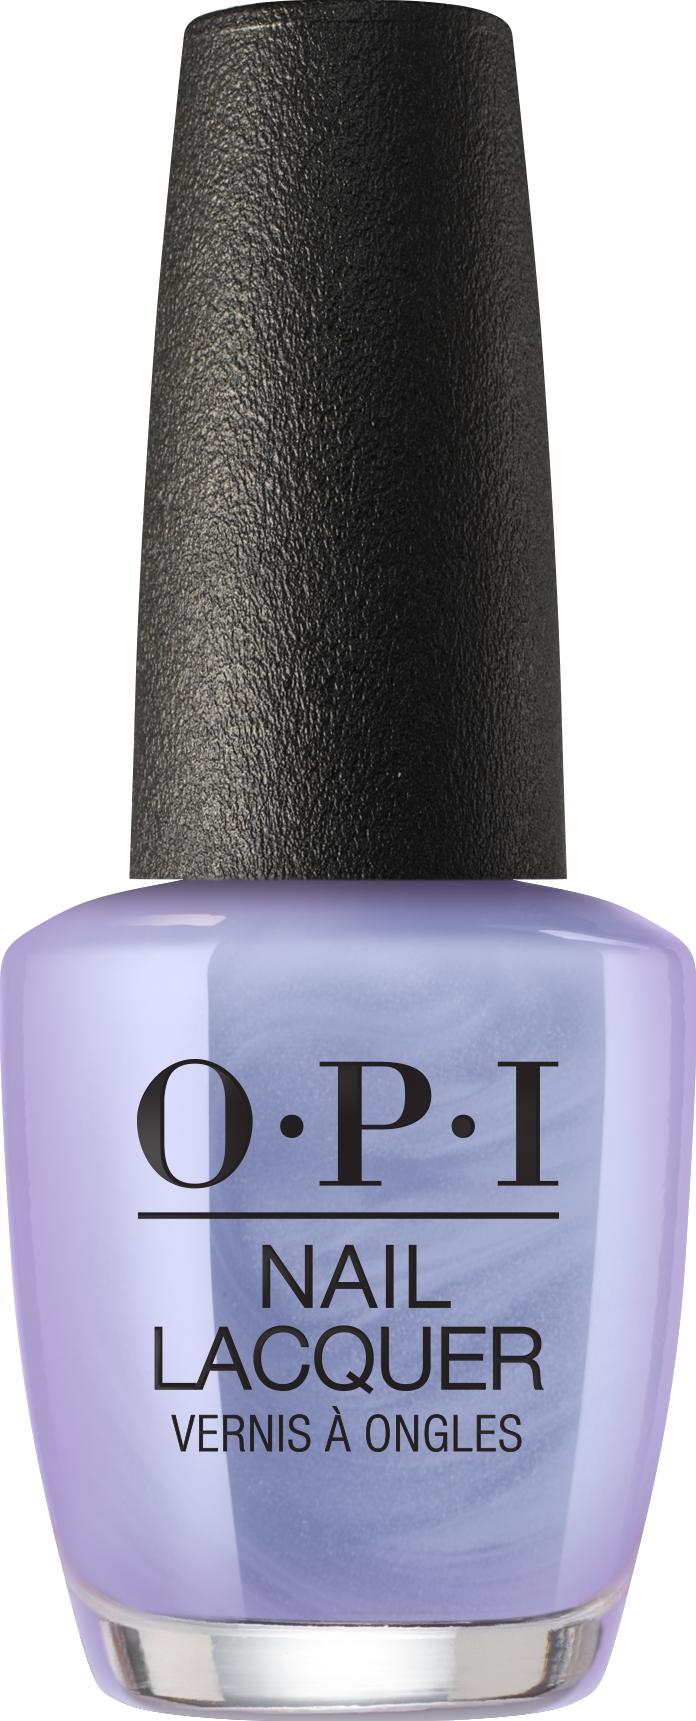 OPI purple nail polish